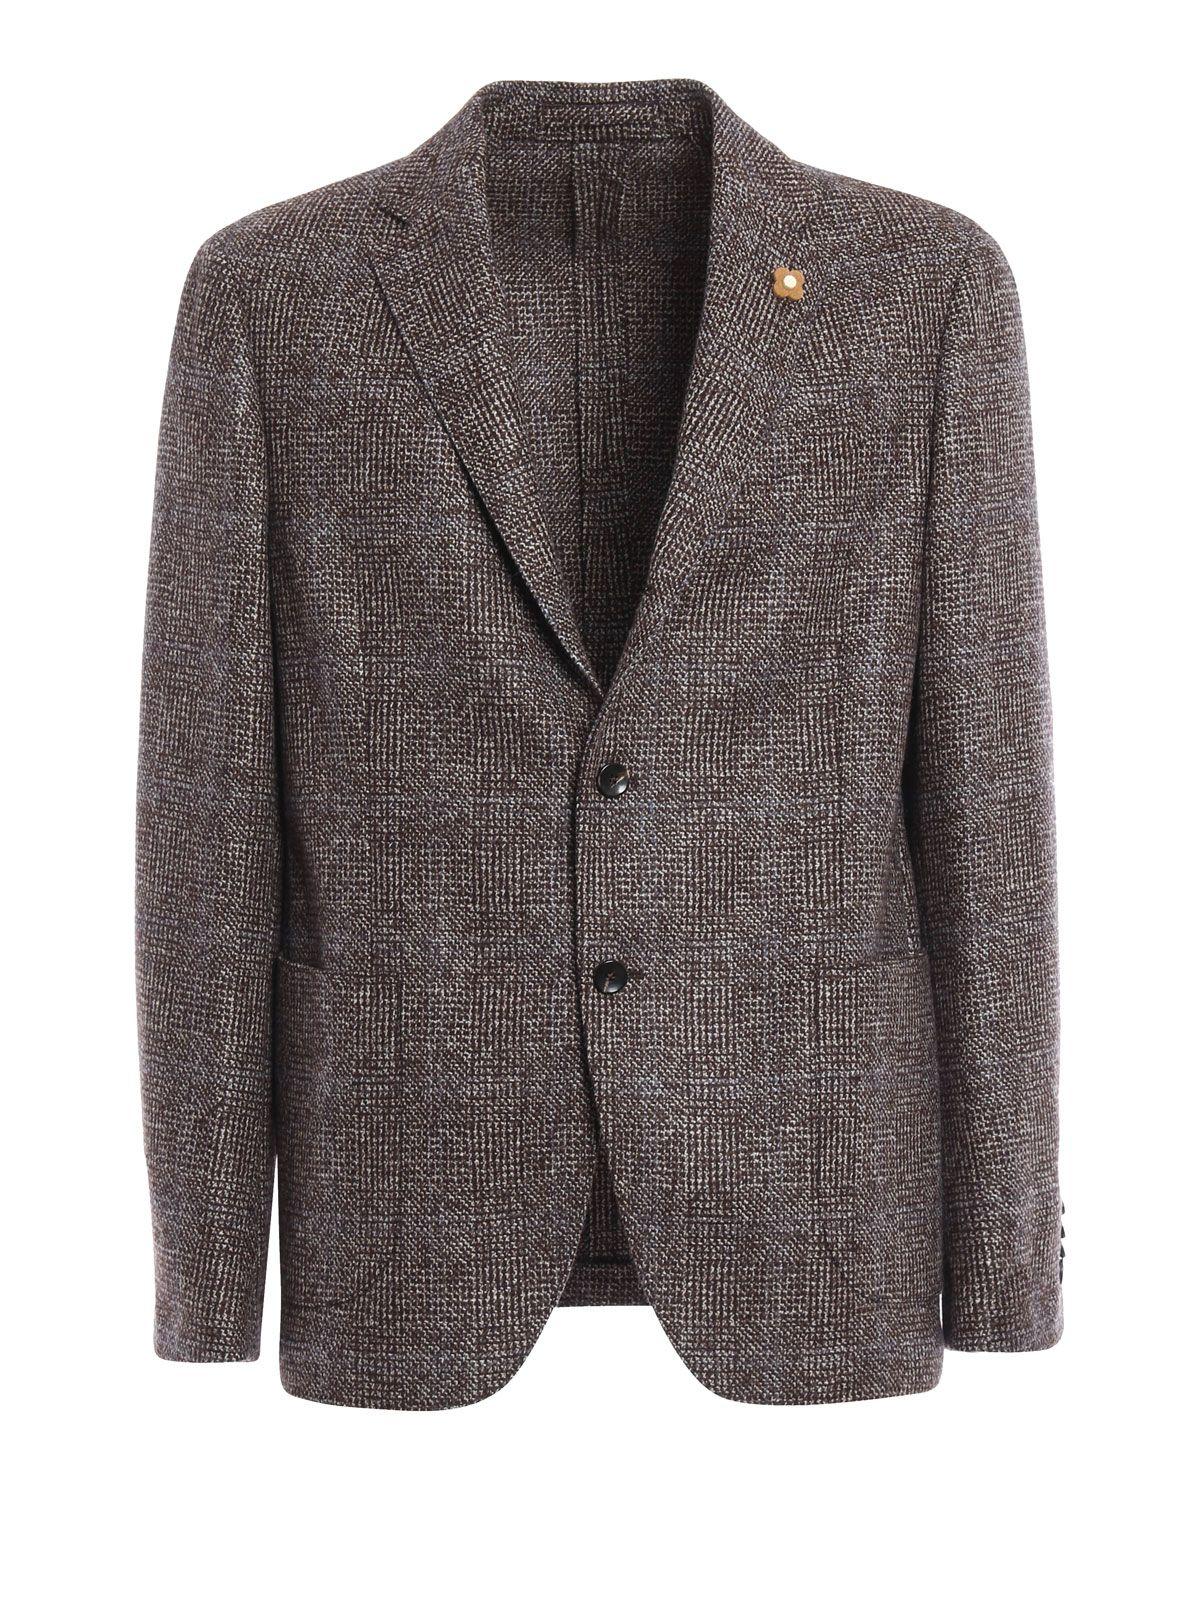 Lardini Wool Tweed Unlined Blazer